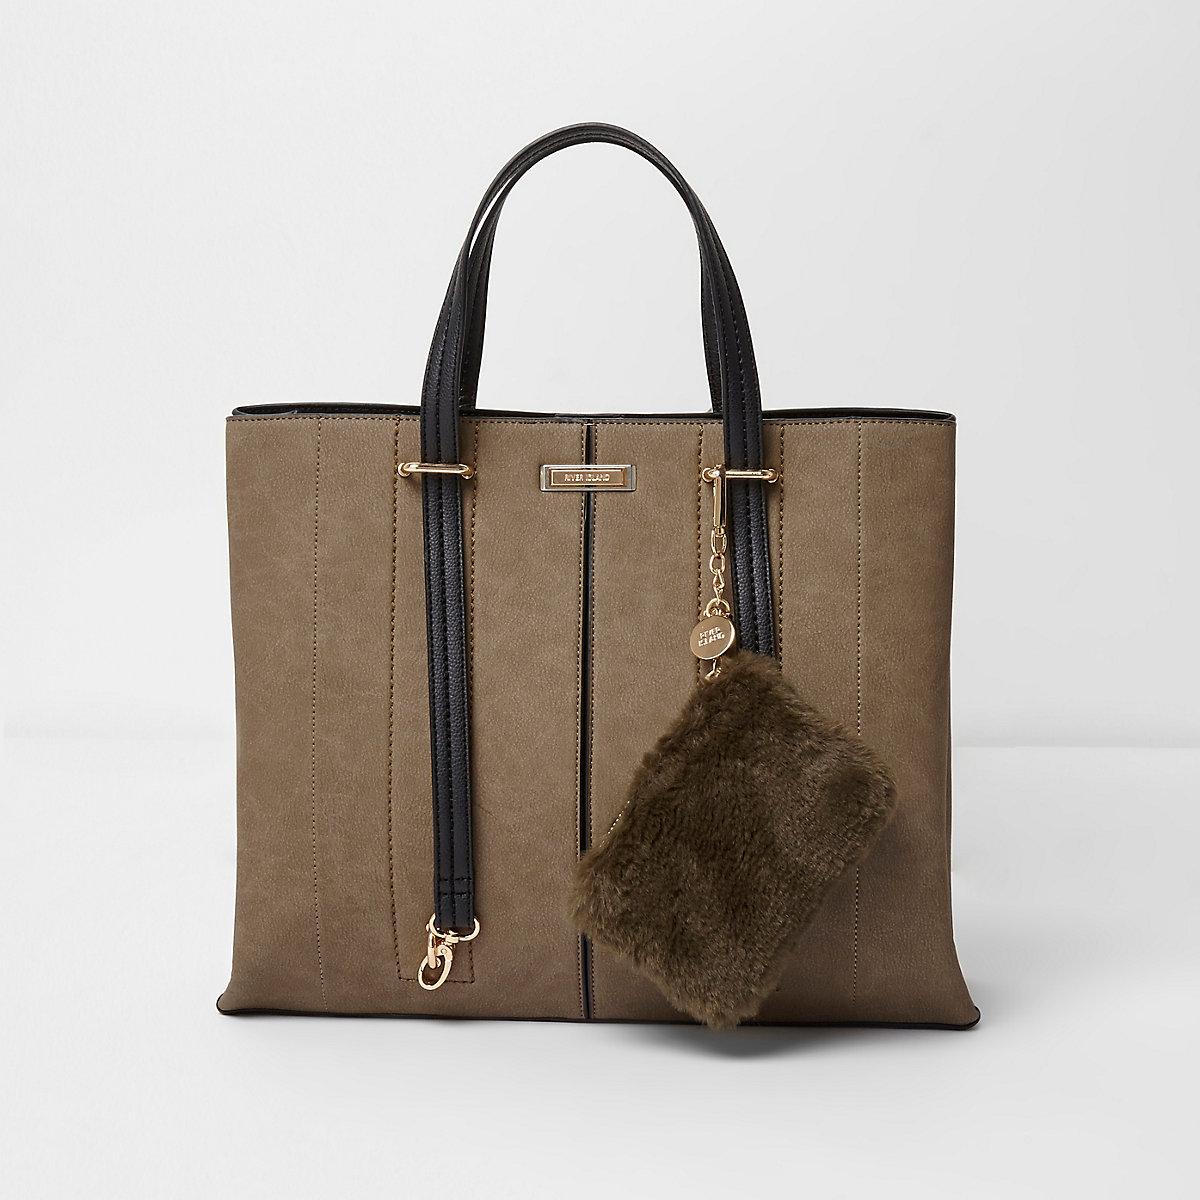 Khaki long handle pouchette tote bag